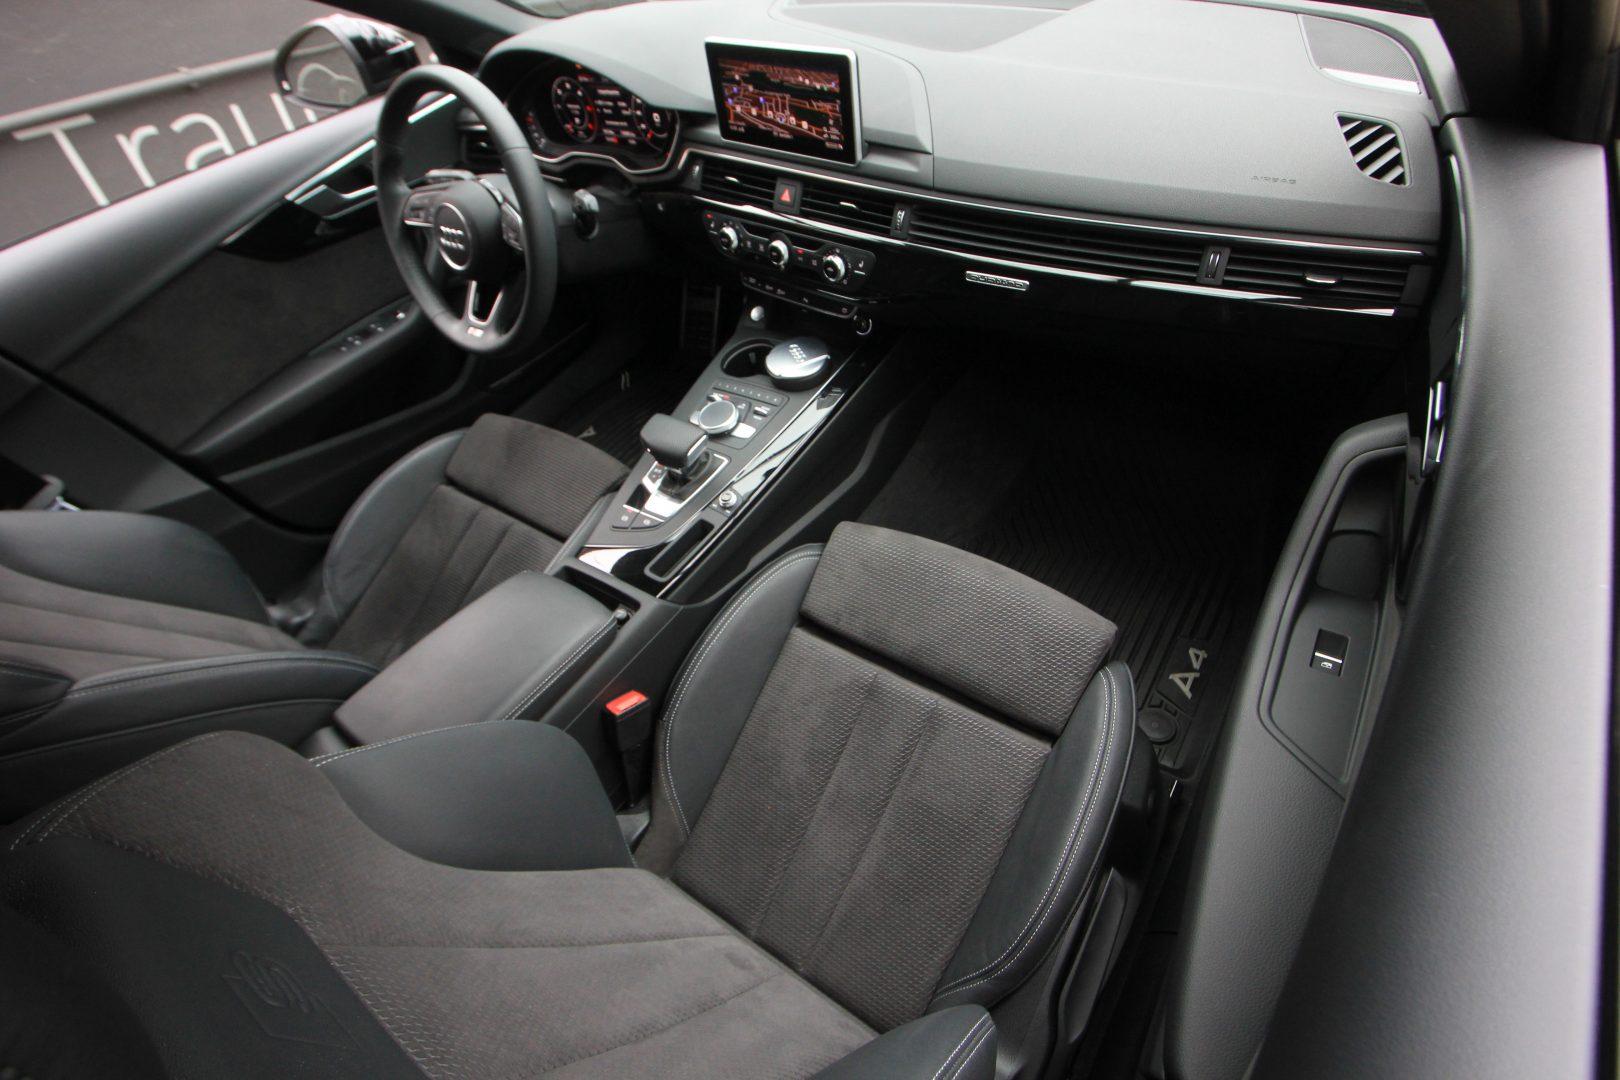 AIL Audi A4 Avant S line Sport / Plus quattro 3.0 TDI 8